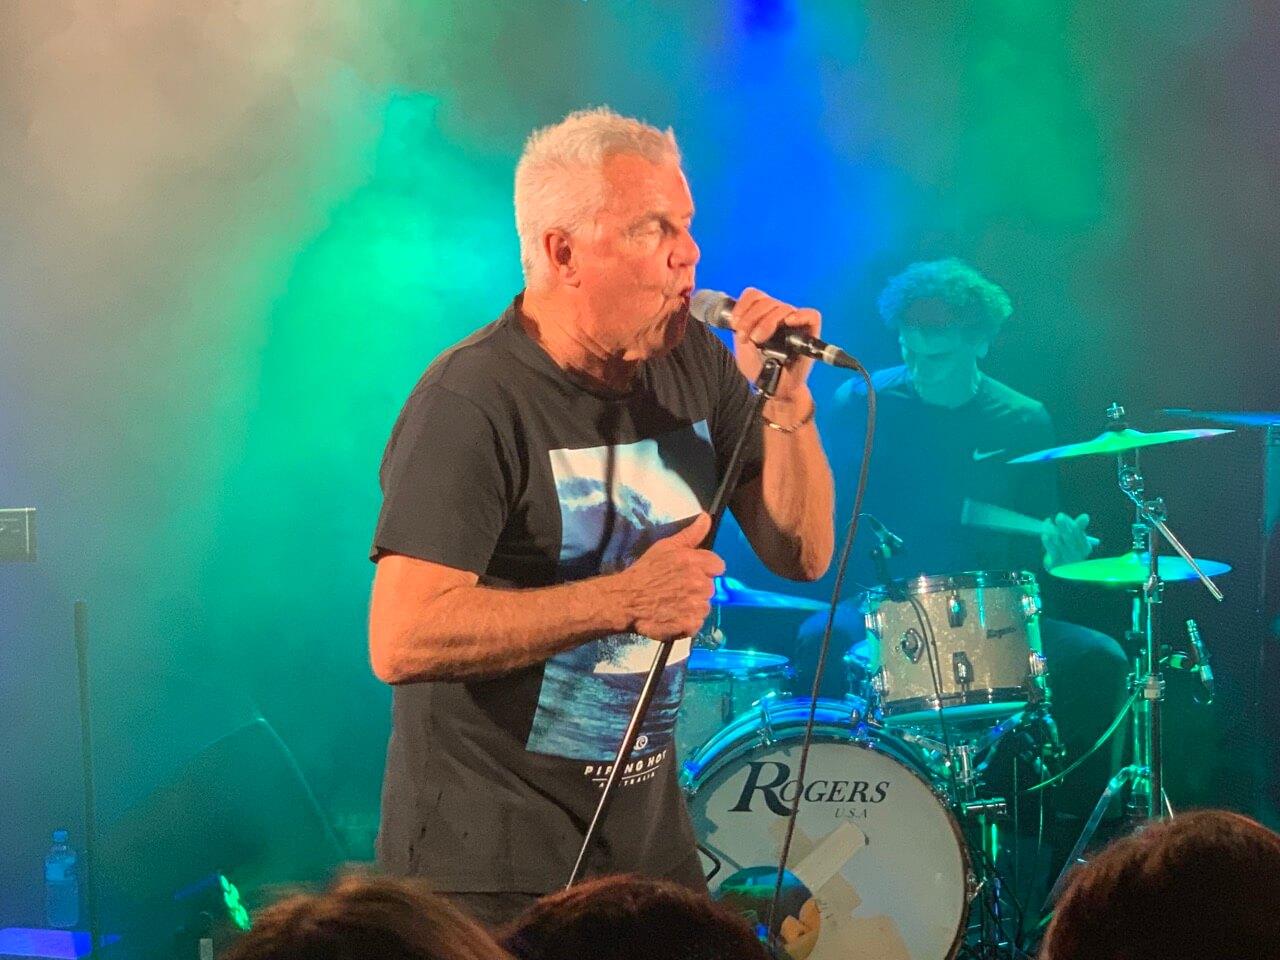 Daryl Braithwaite | Australian Recording Artist